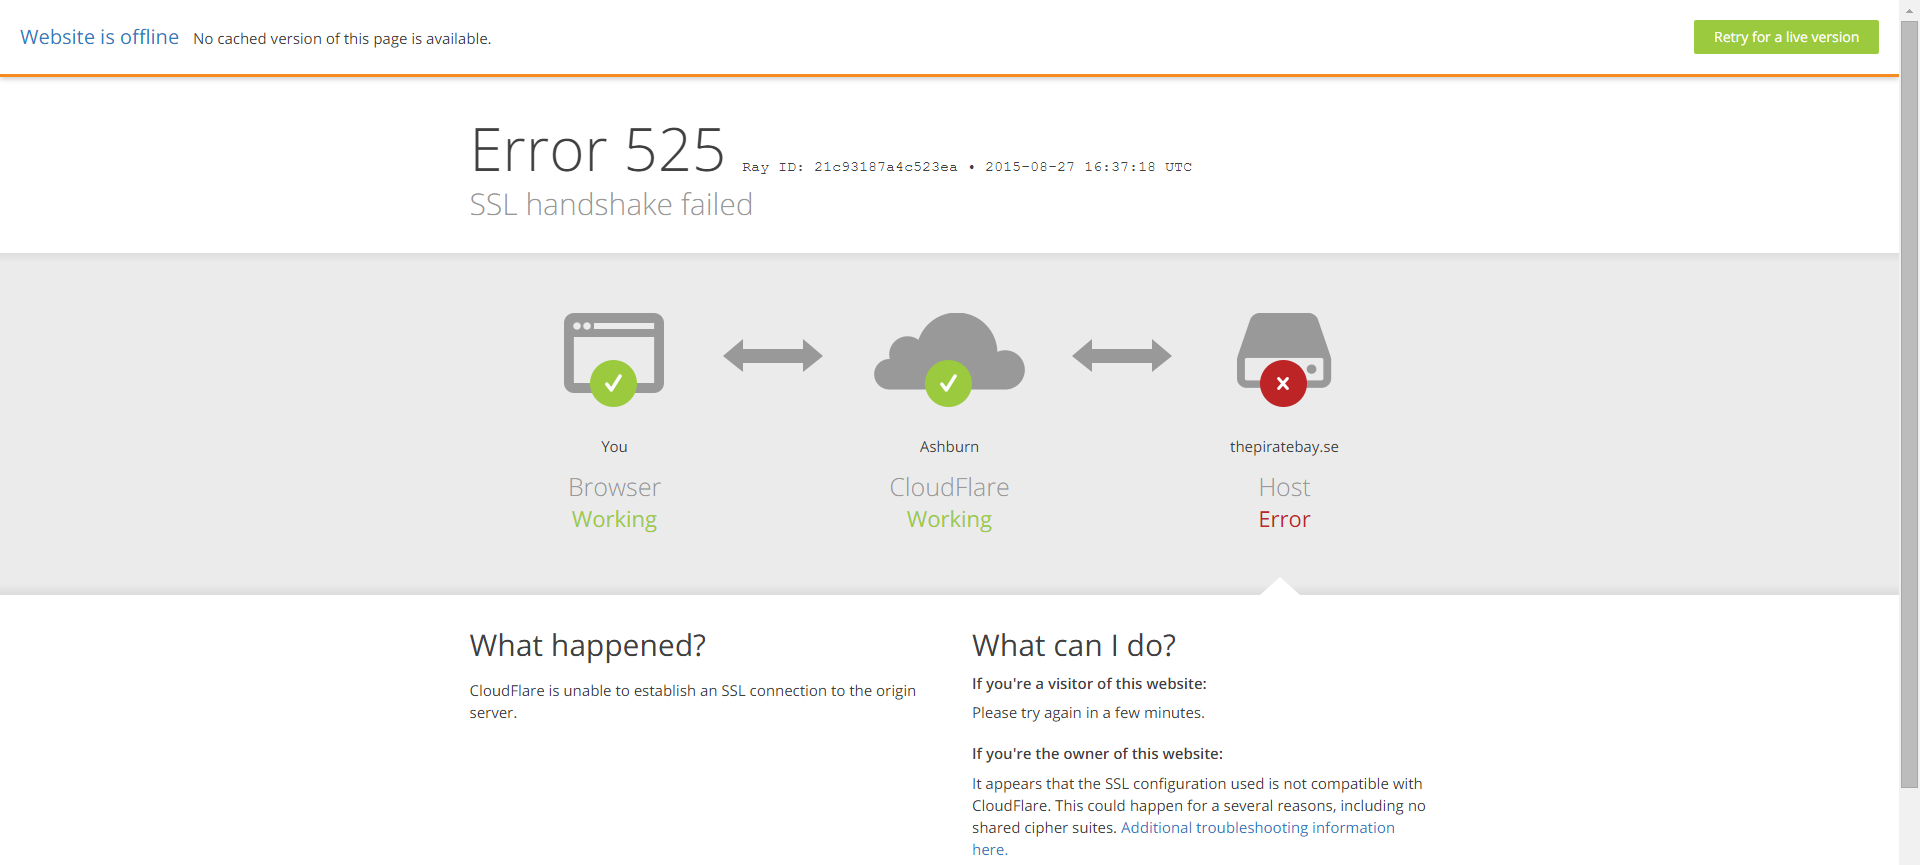 tpb_down_error_525